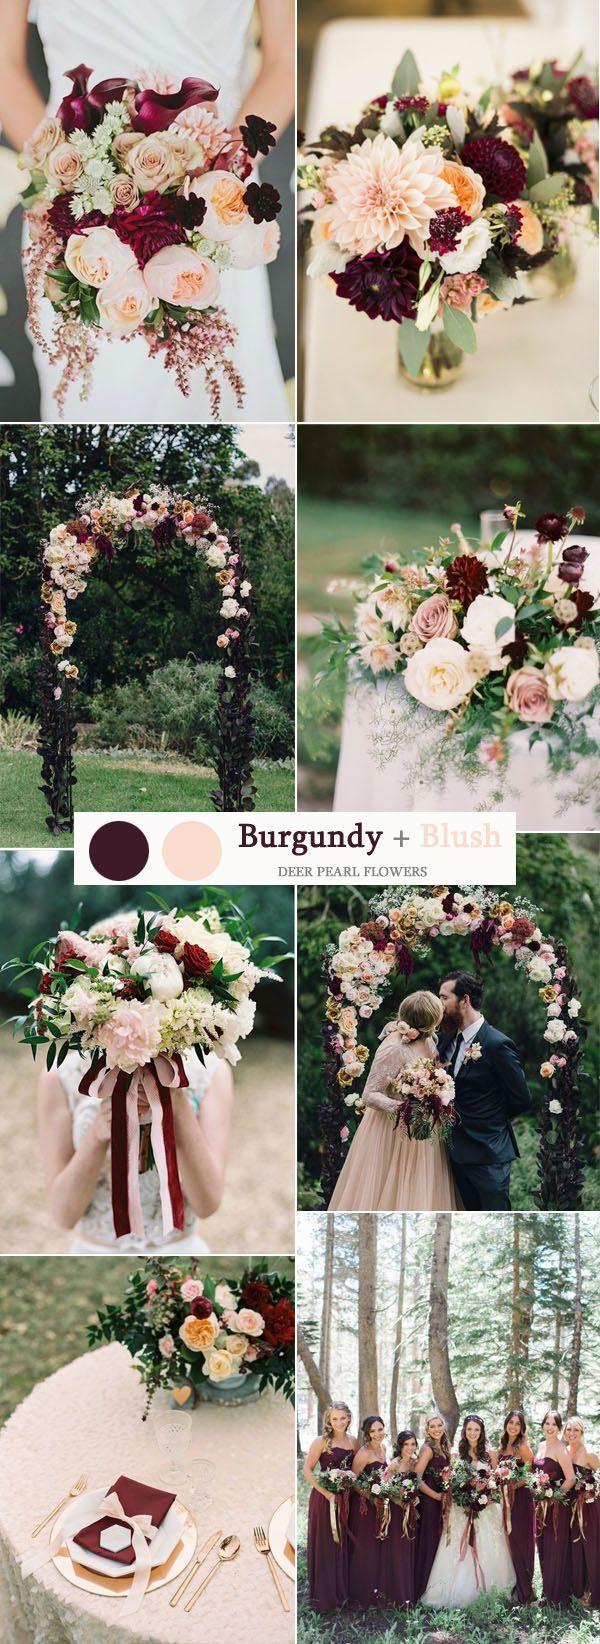 Top 8 Burgundy Wedding Color Palettes You\'ll Love | Pinterest ...